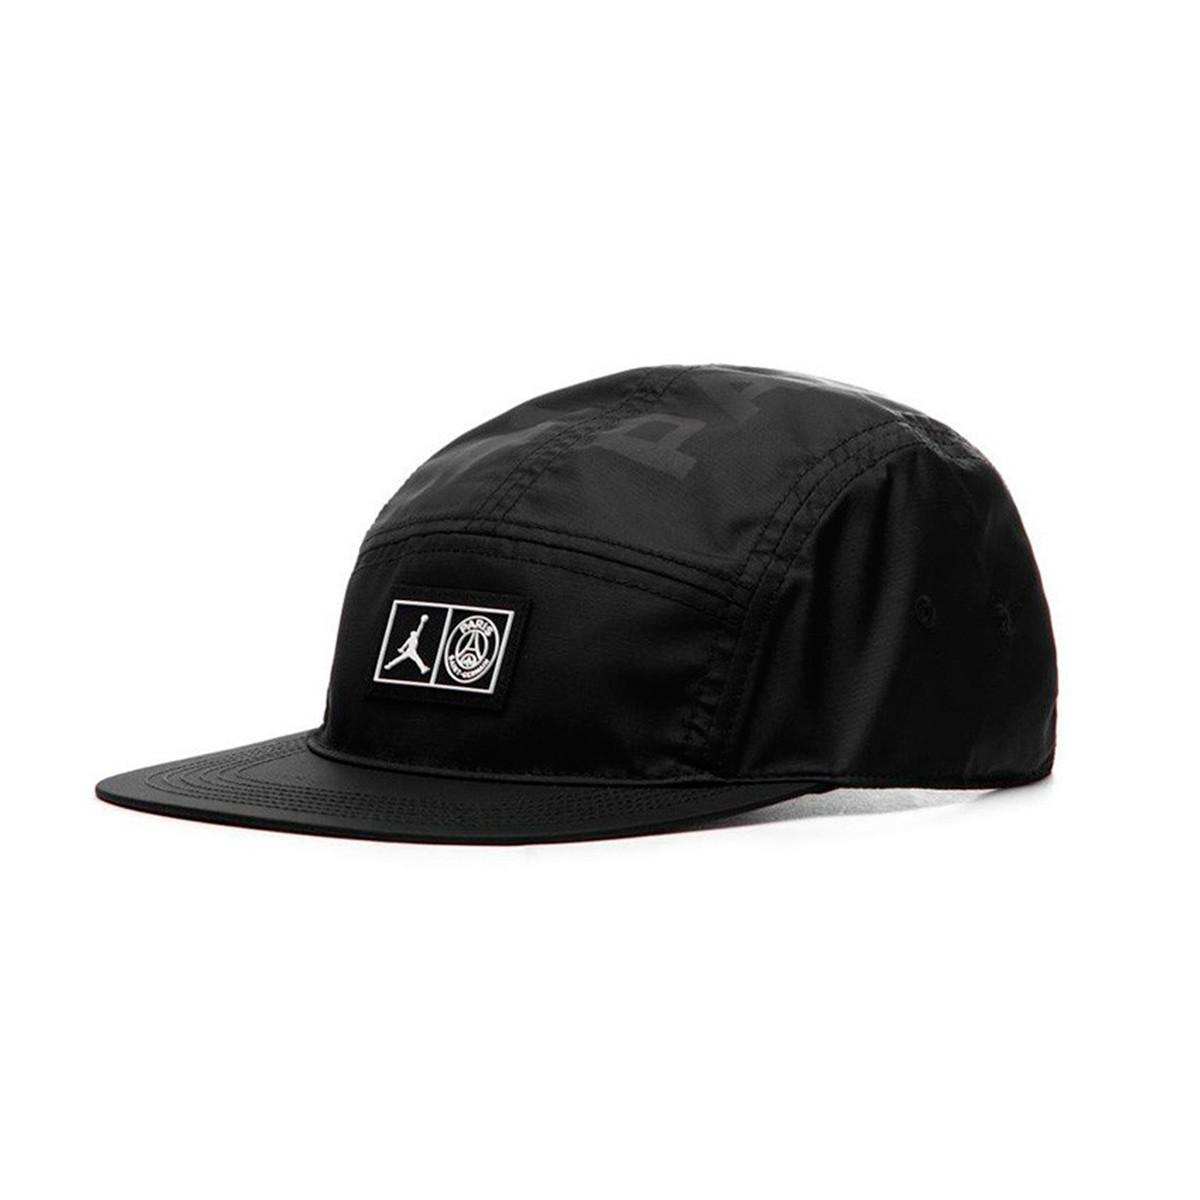 3182fe26398 Cap Nike Jordan x PSG AW Black - Tienda de fútbol Fútbol Emotion